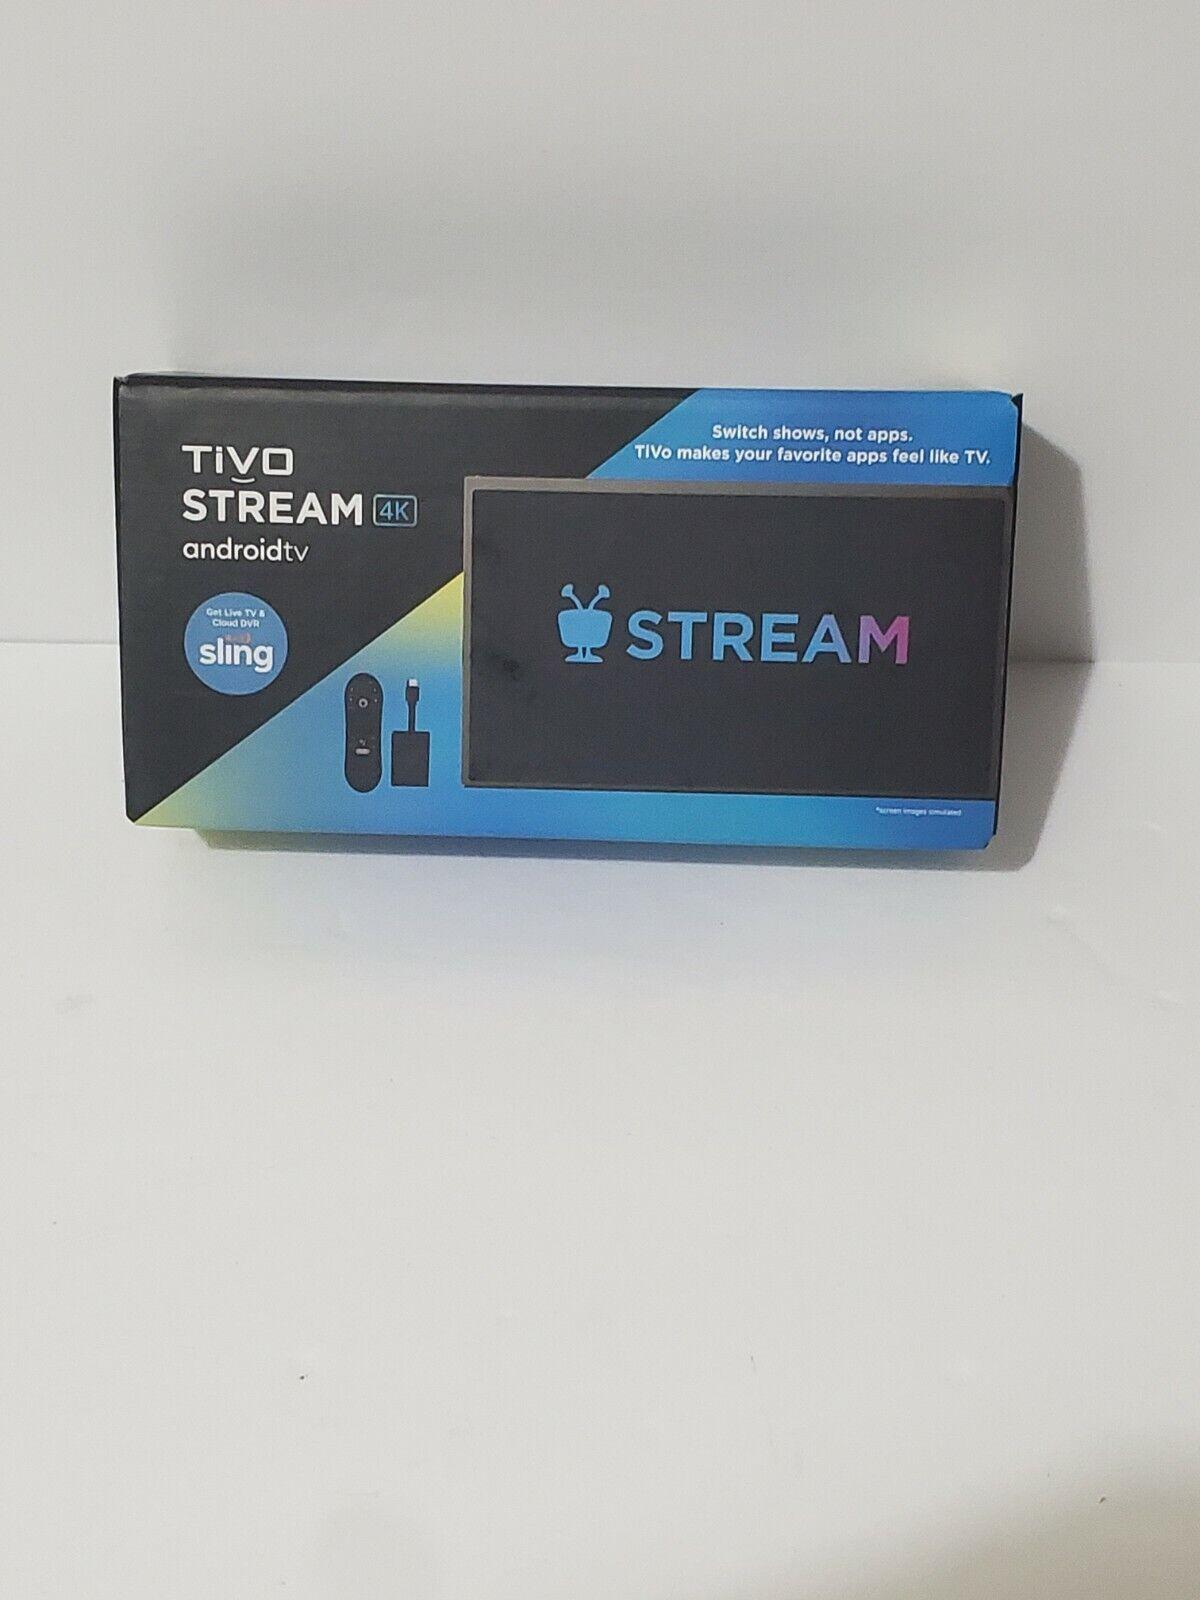 TiVo Stream 4K Android Media Player BRAND NEW!  Free Shipping! SEALED android brand media player sealed stream tivo